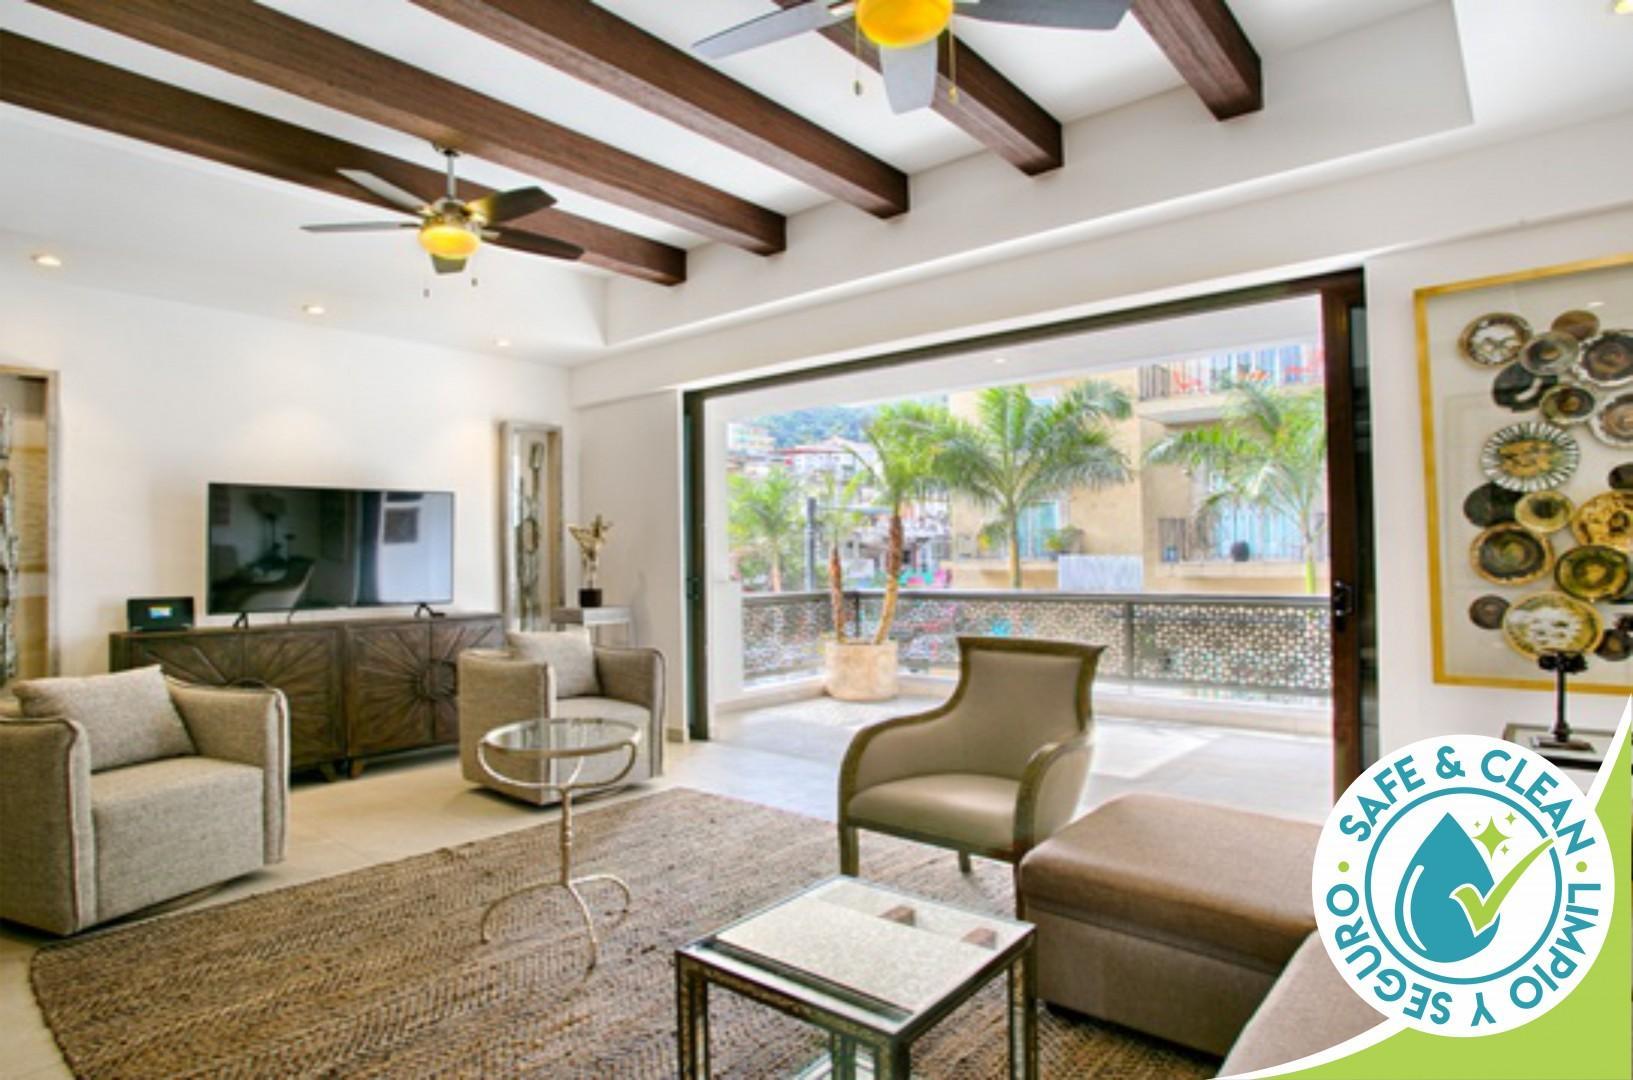 Luxury 2 Bdrm Condo, Walk to Everything in Zona Romantica | Pool, BBQ